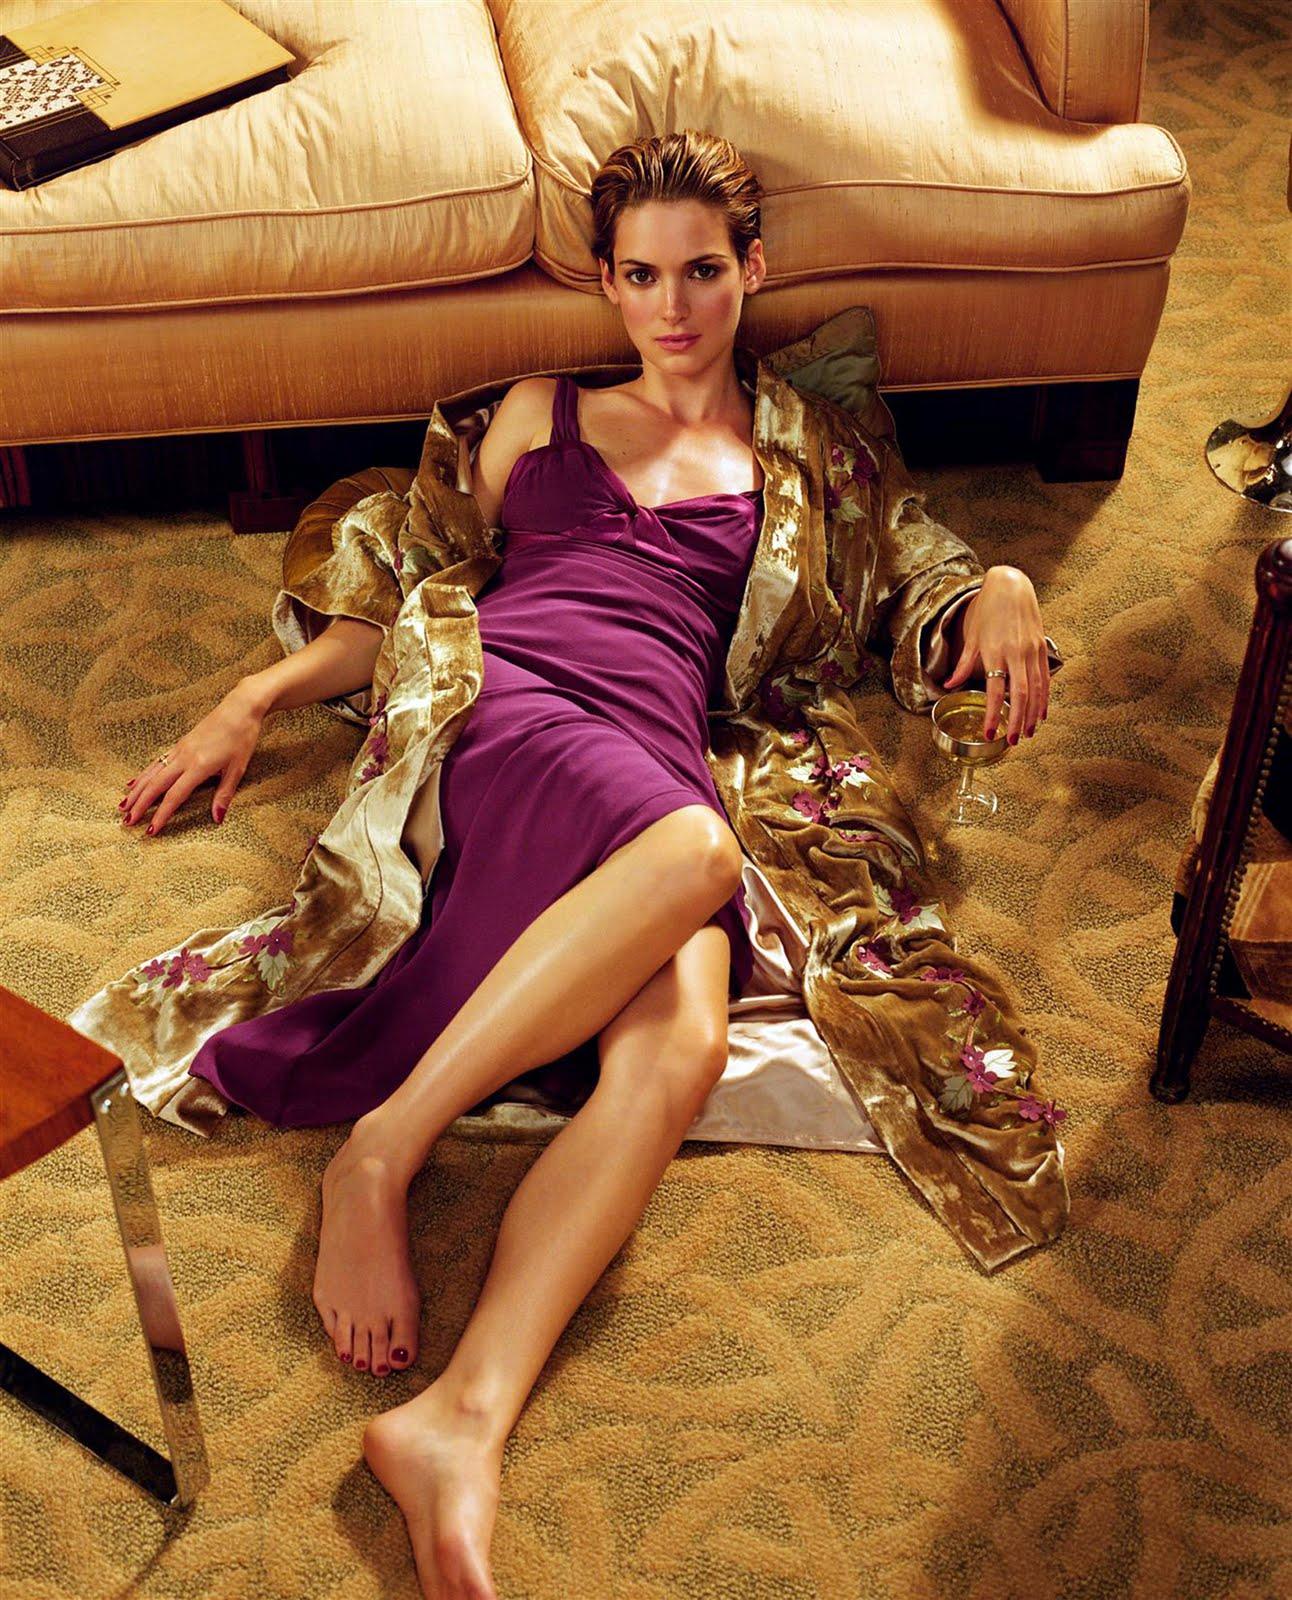 http://1.bp.blogspot.com/_UaLWp72nij4/THLjxNNsDNI/AAAAAAAAT8Y/BRRC3H-K72o/s1600/winona-ryder-feet-2.jpg